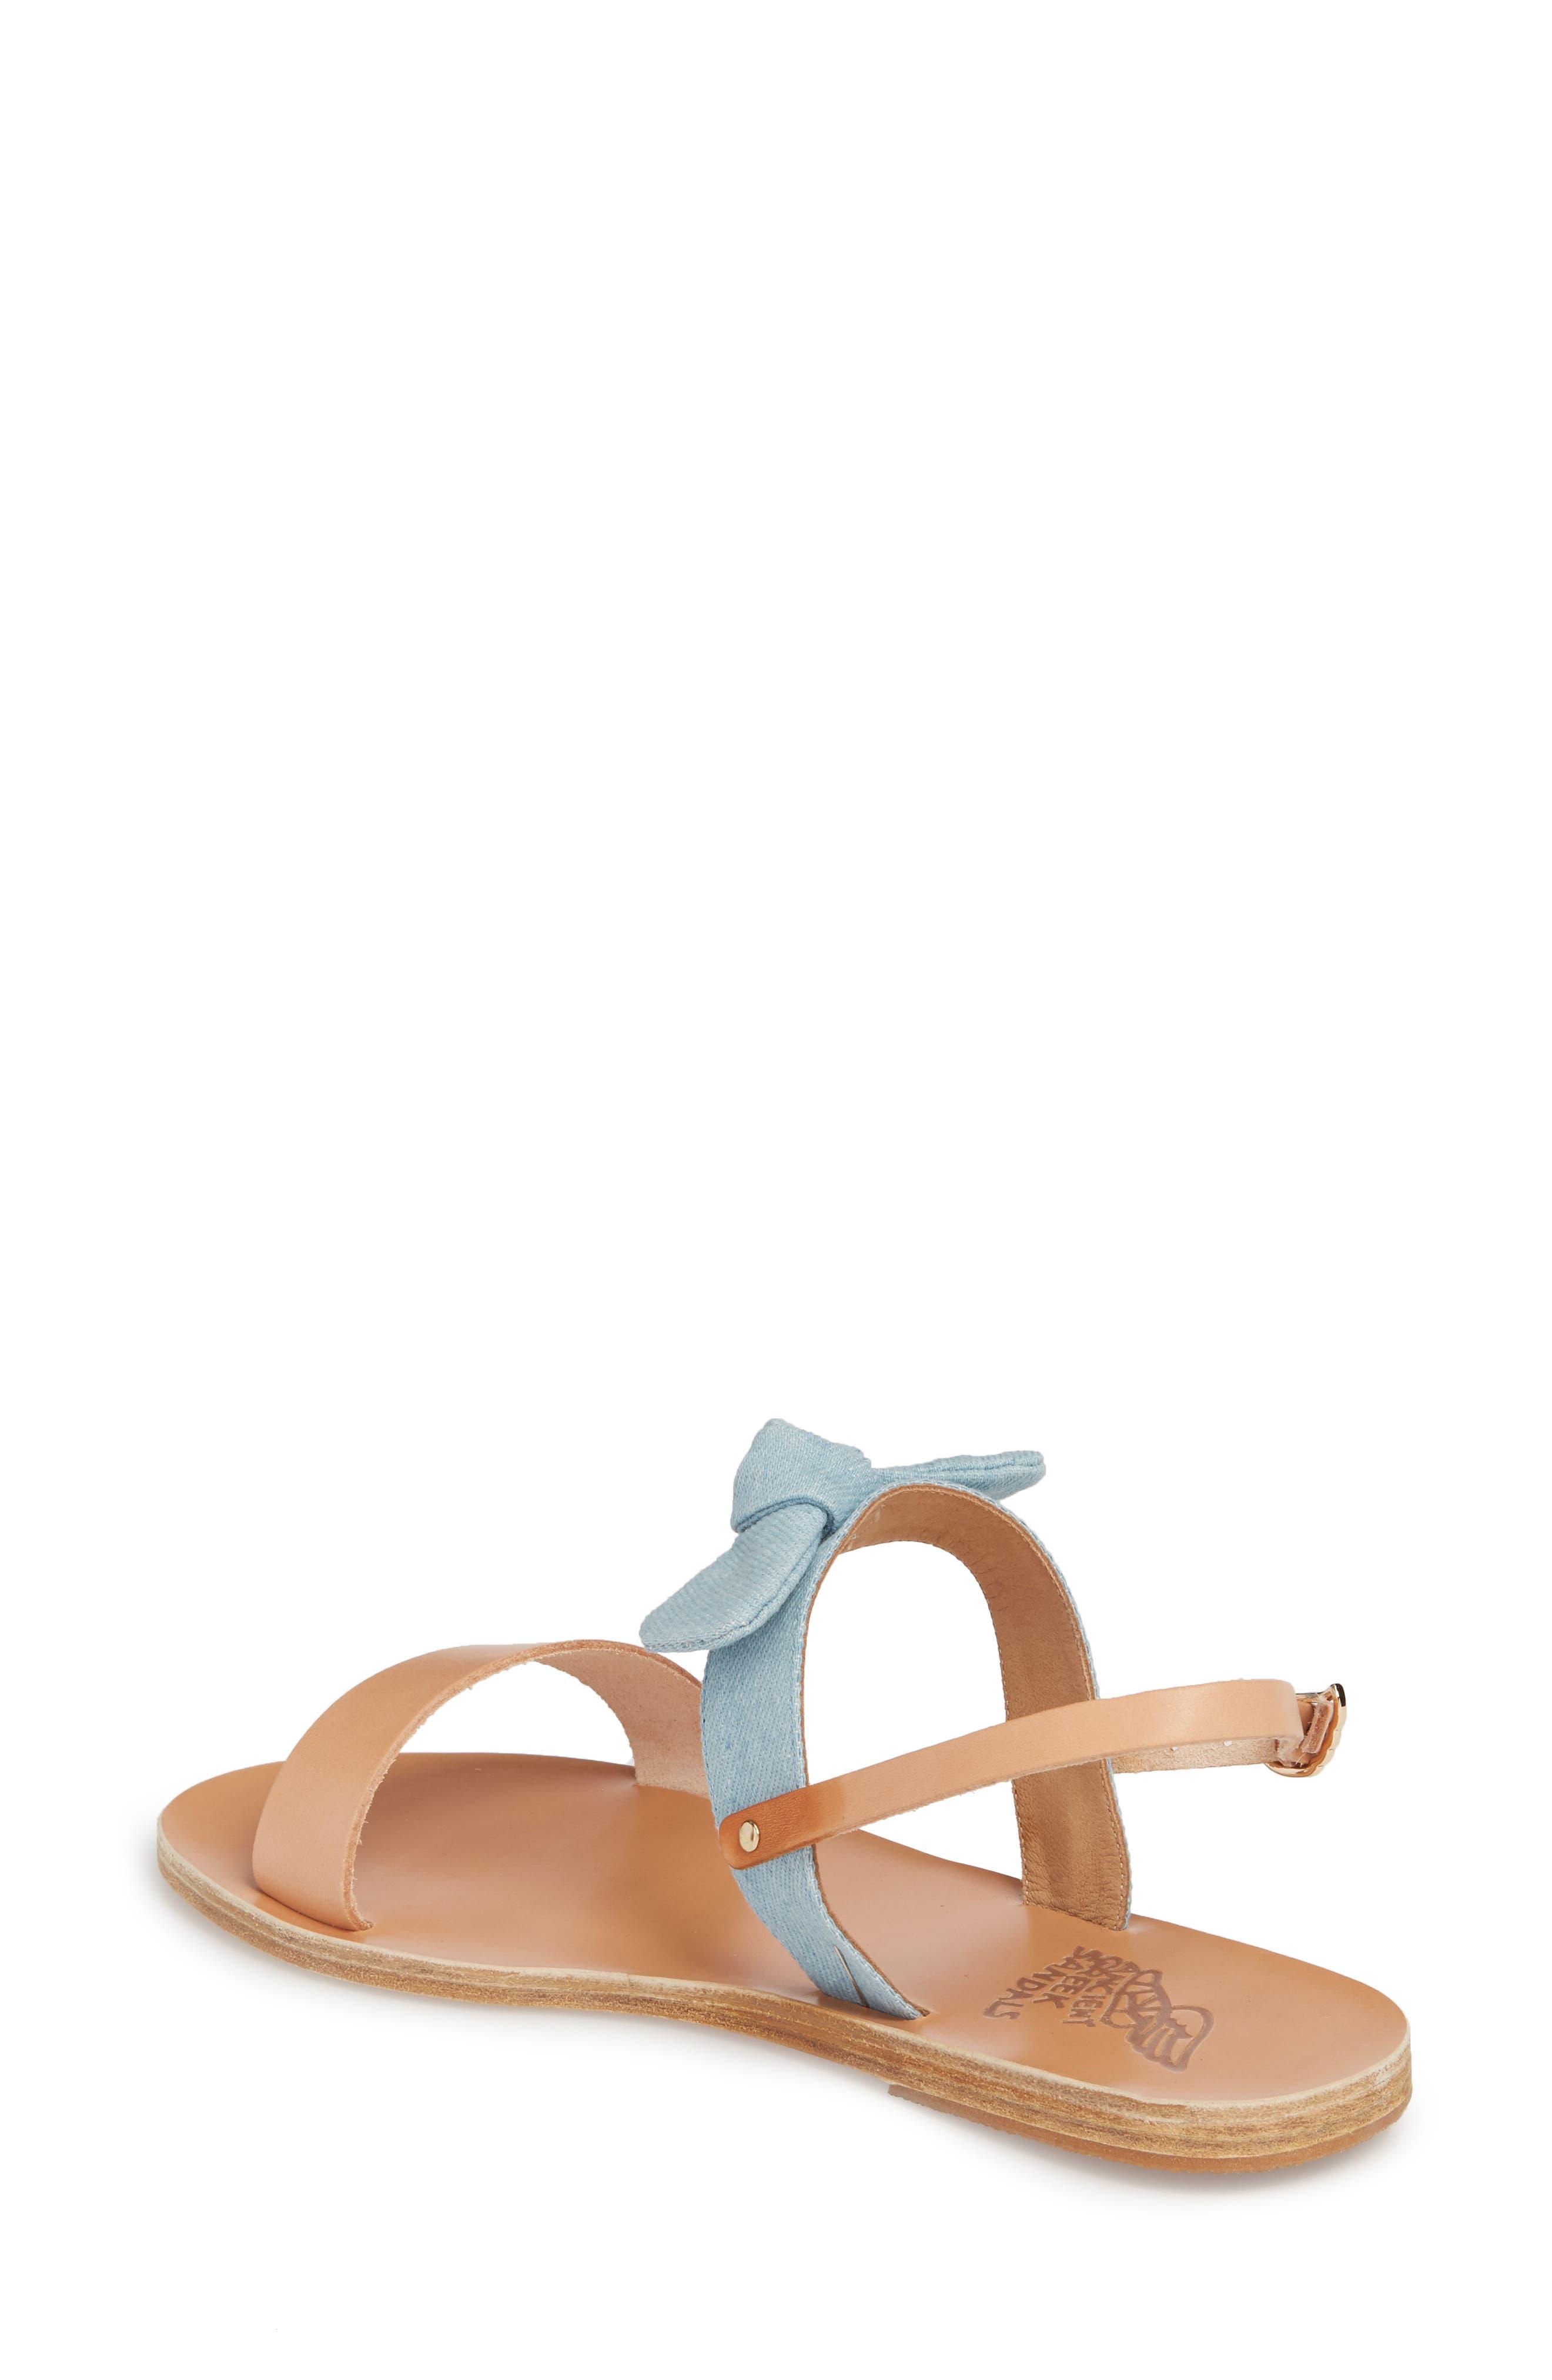 Clio Bow Sandal,                             Alternate thumbnail 2, color,                             400